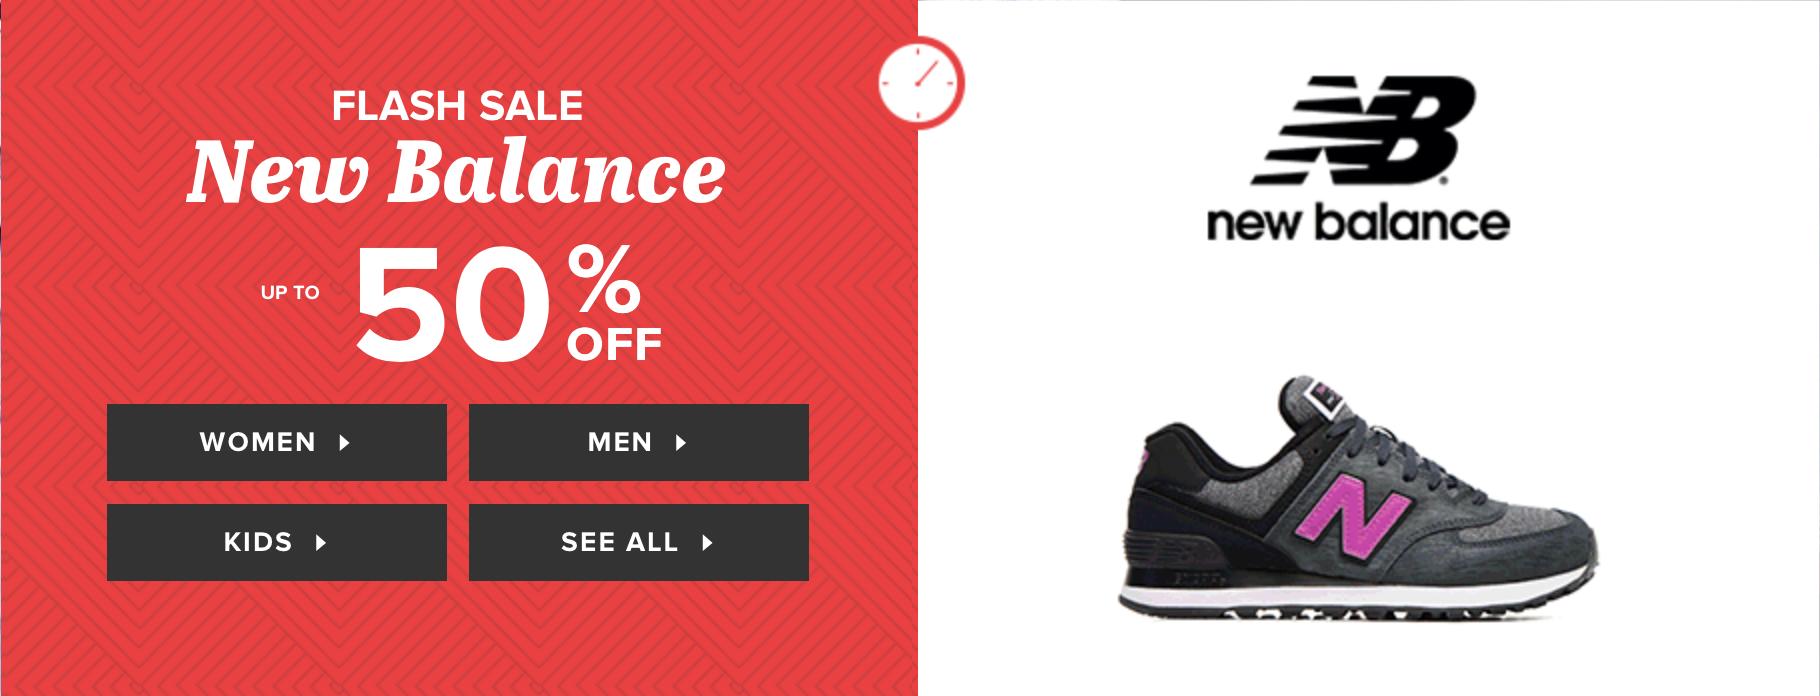 Sarenza: Sale up to 50% off New Balance shoes